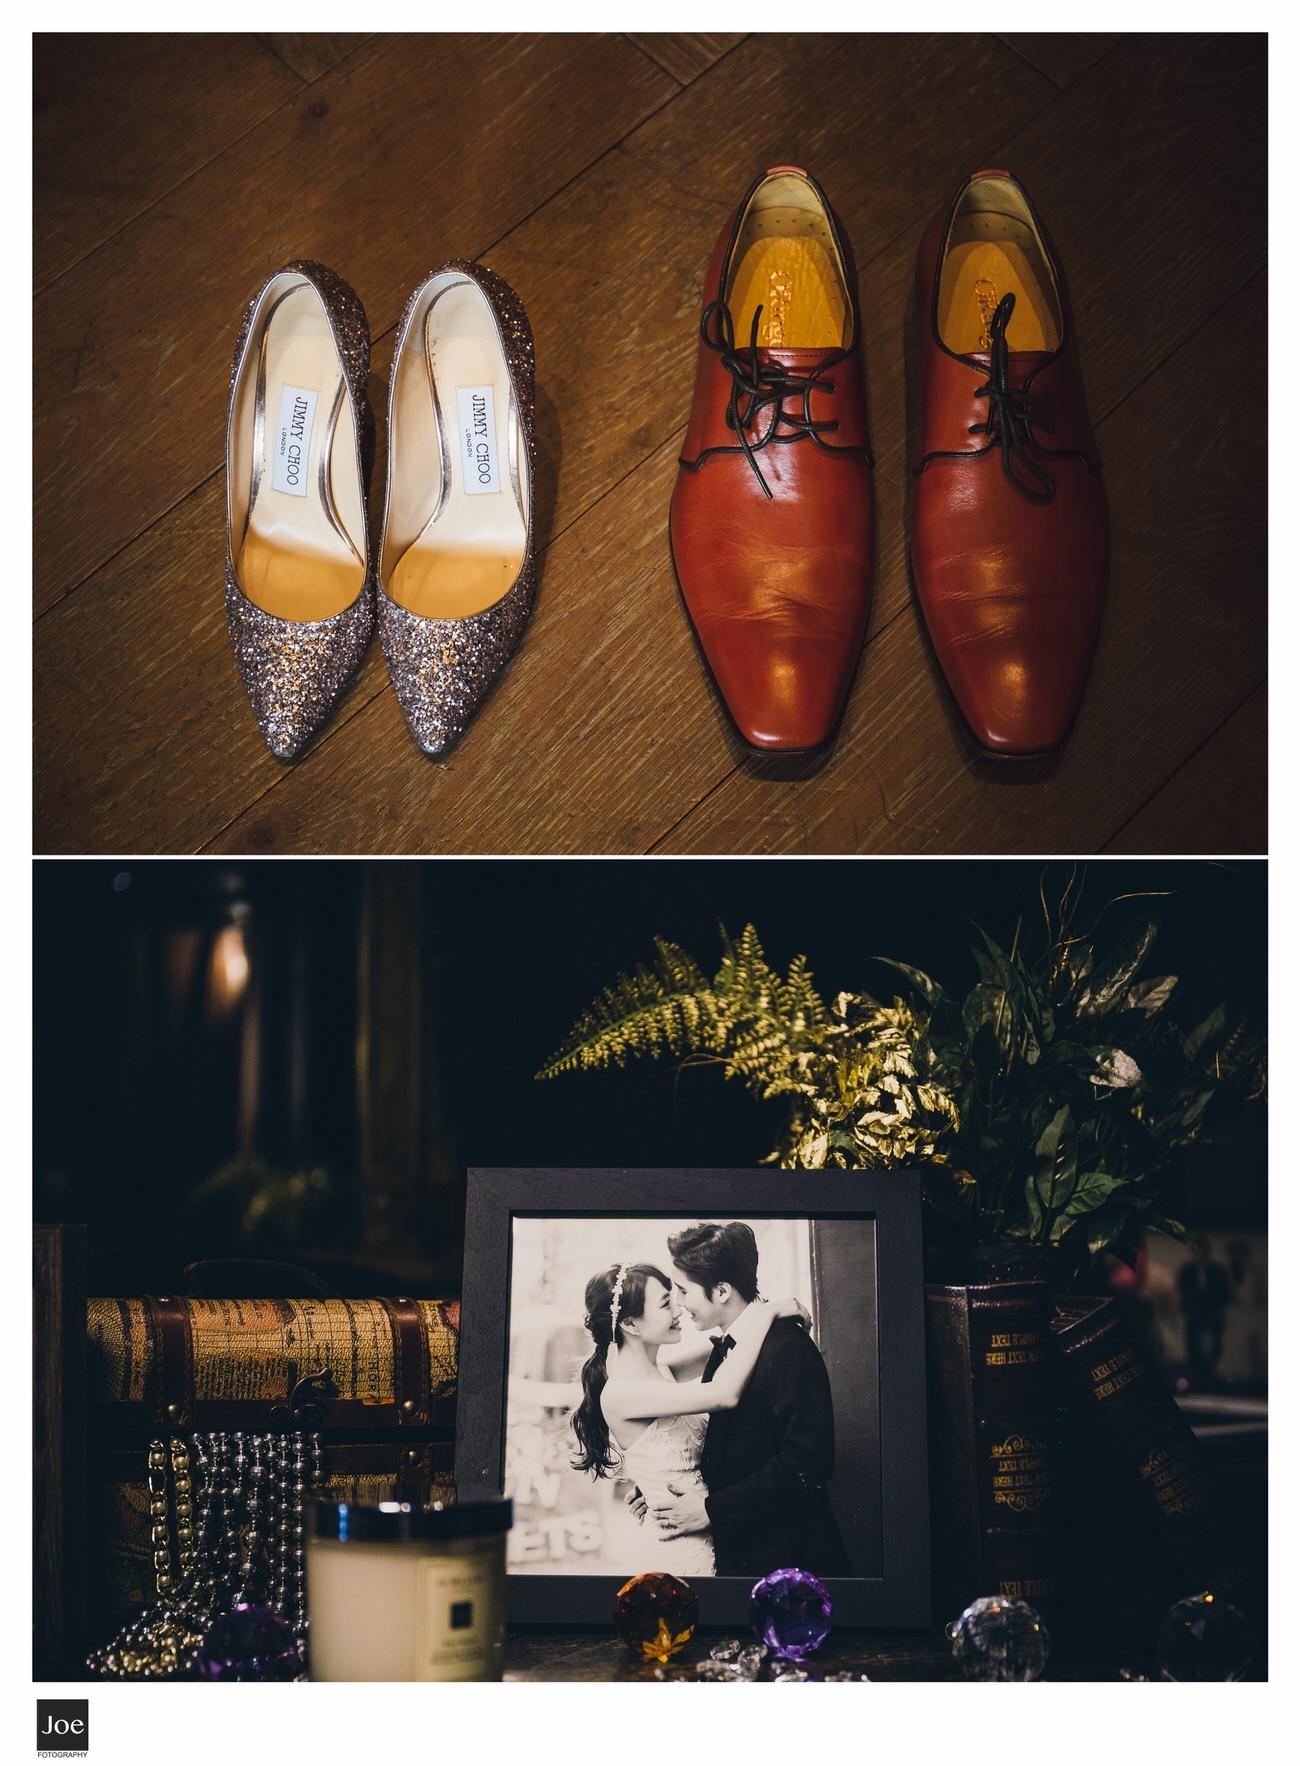 joe-fotography-wedding-photo-palais-de-chine-hotel-006.jpg